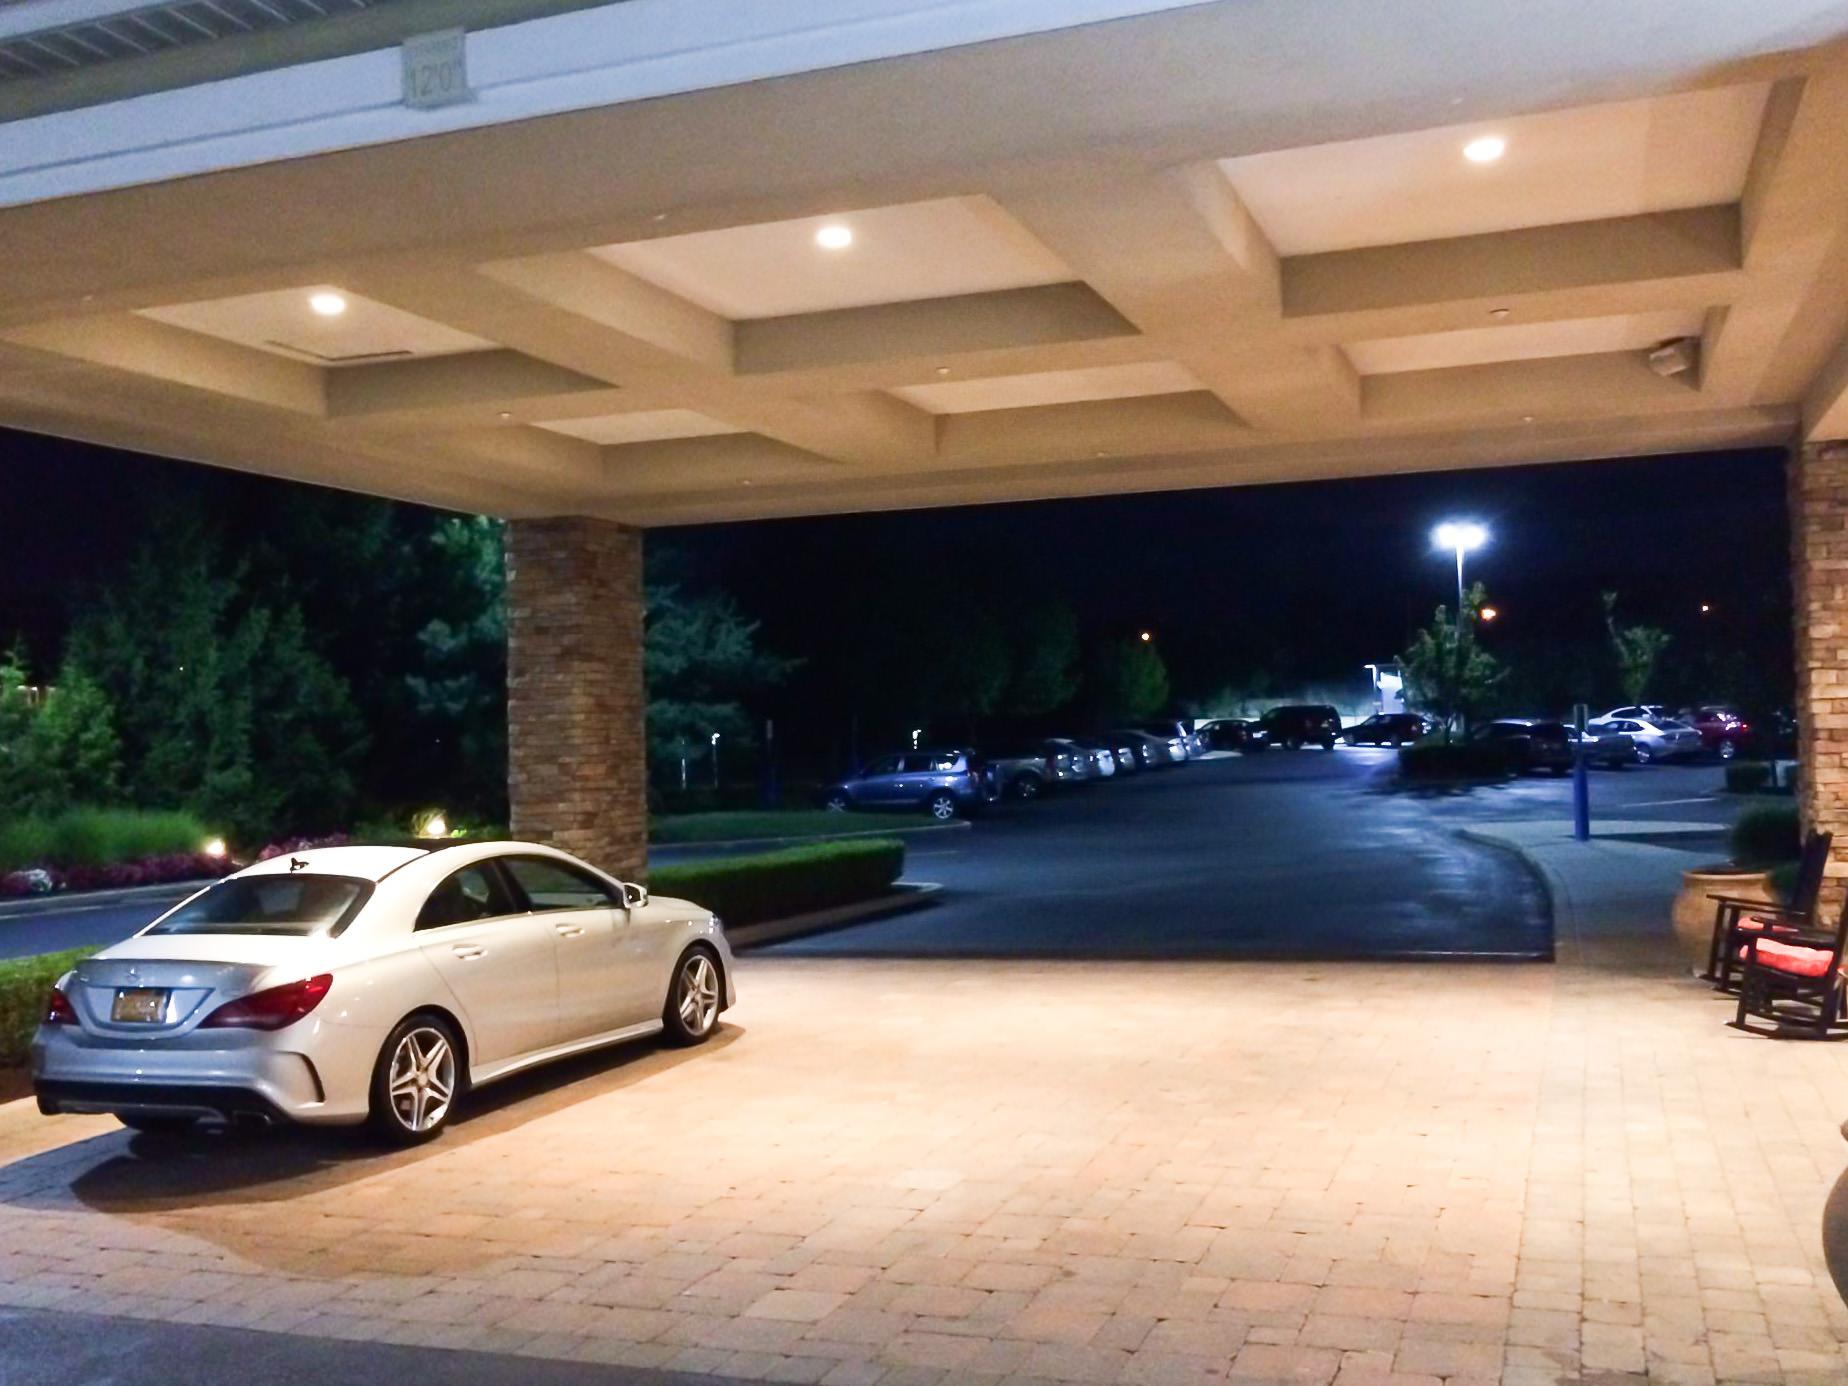 Hilton Homewood Suites ComPower LED 2-5.jpg